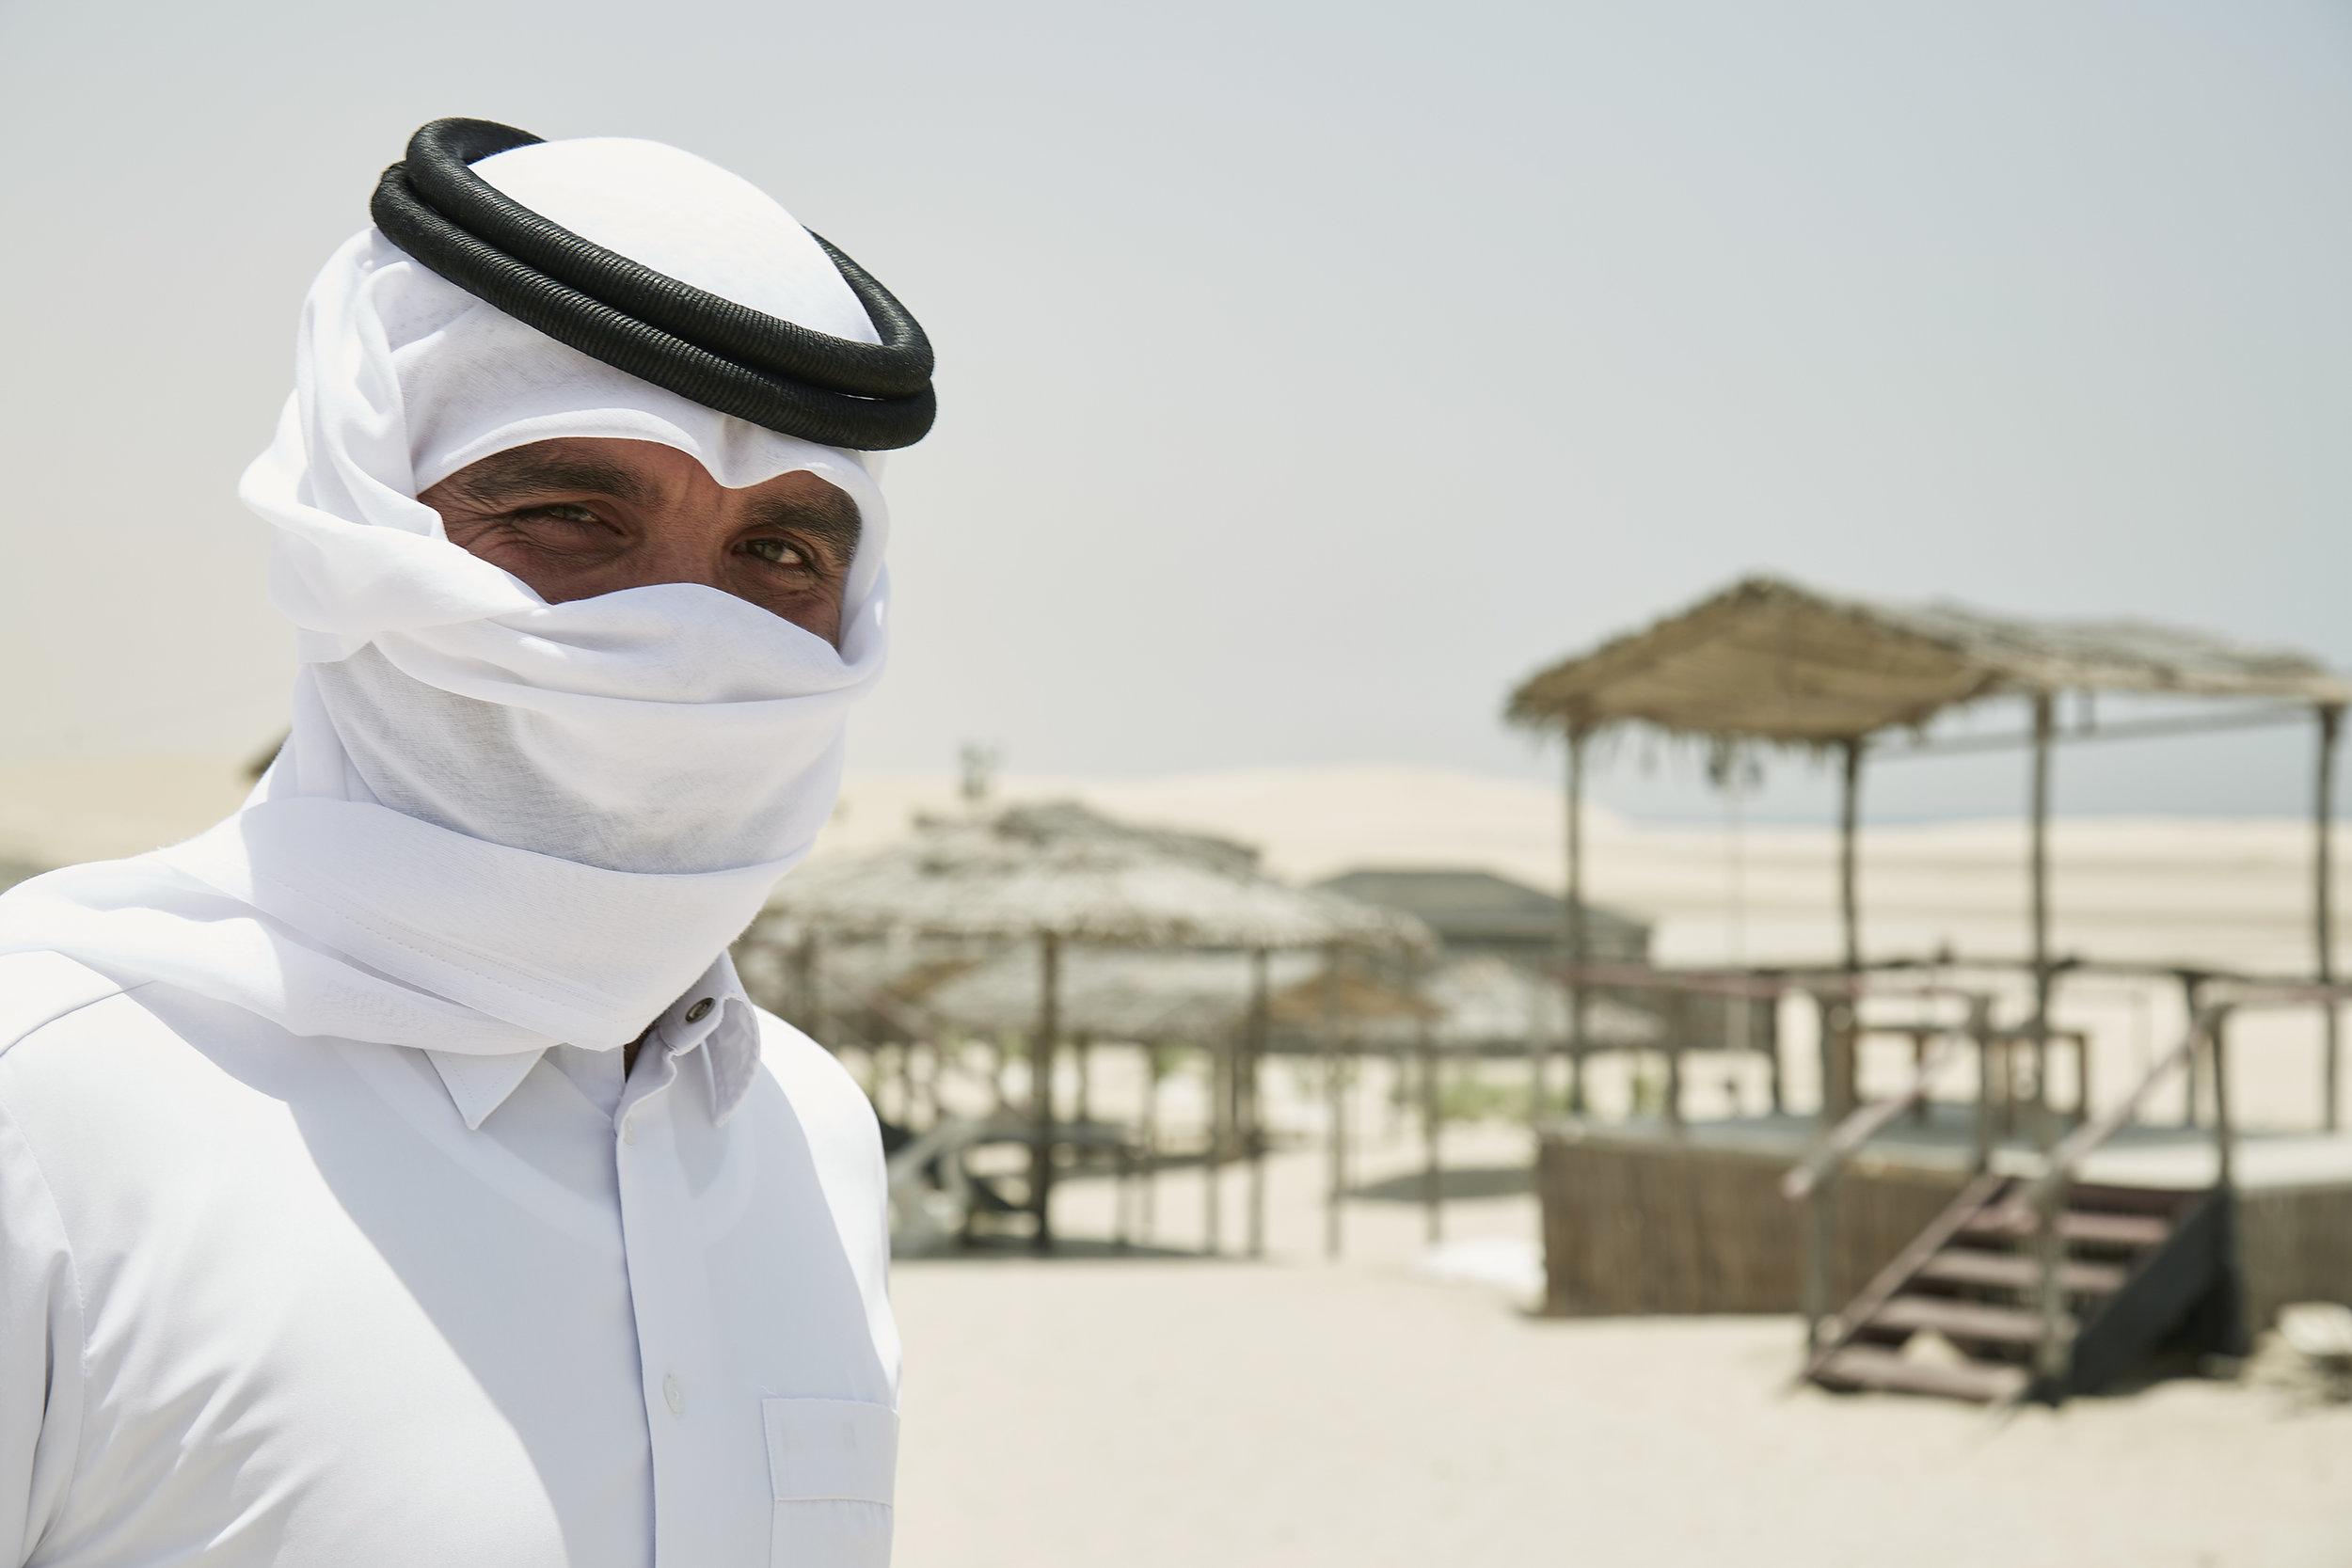 Amir, sand dune driver (from Pakistan)